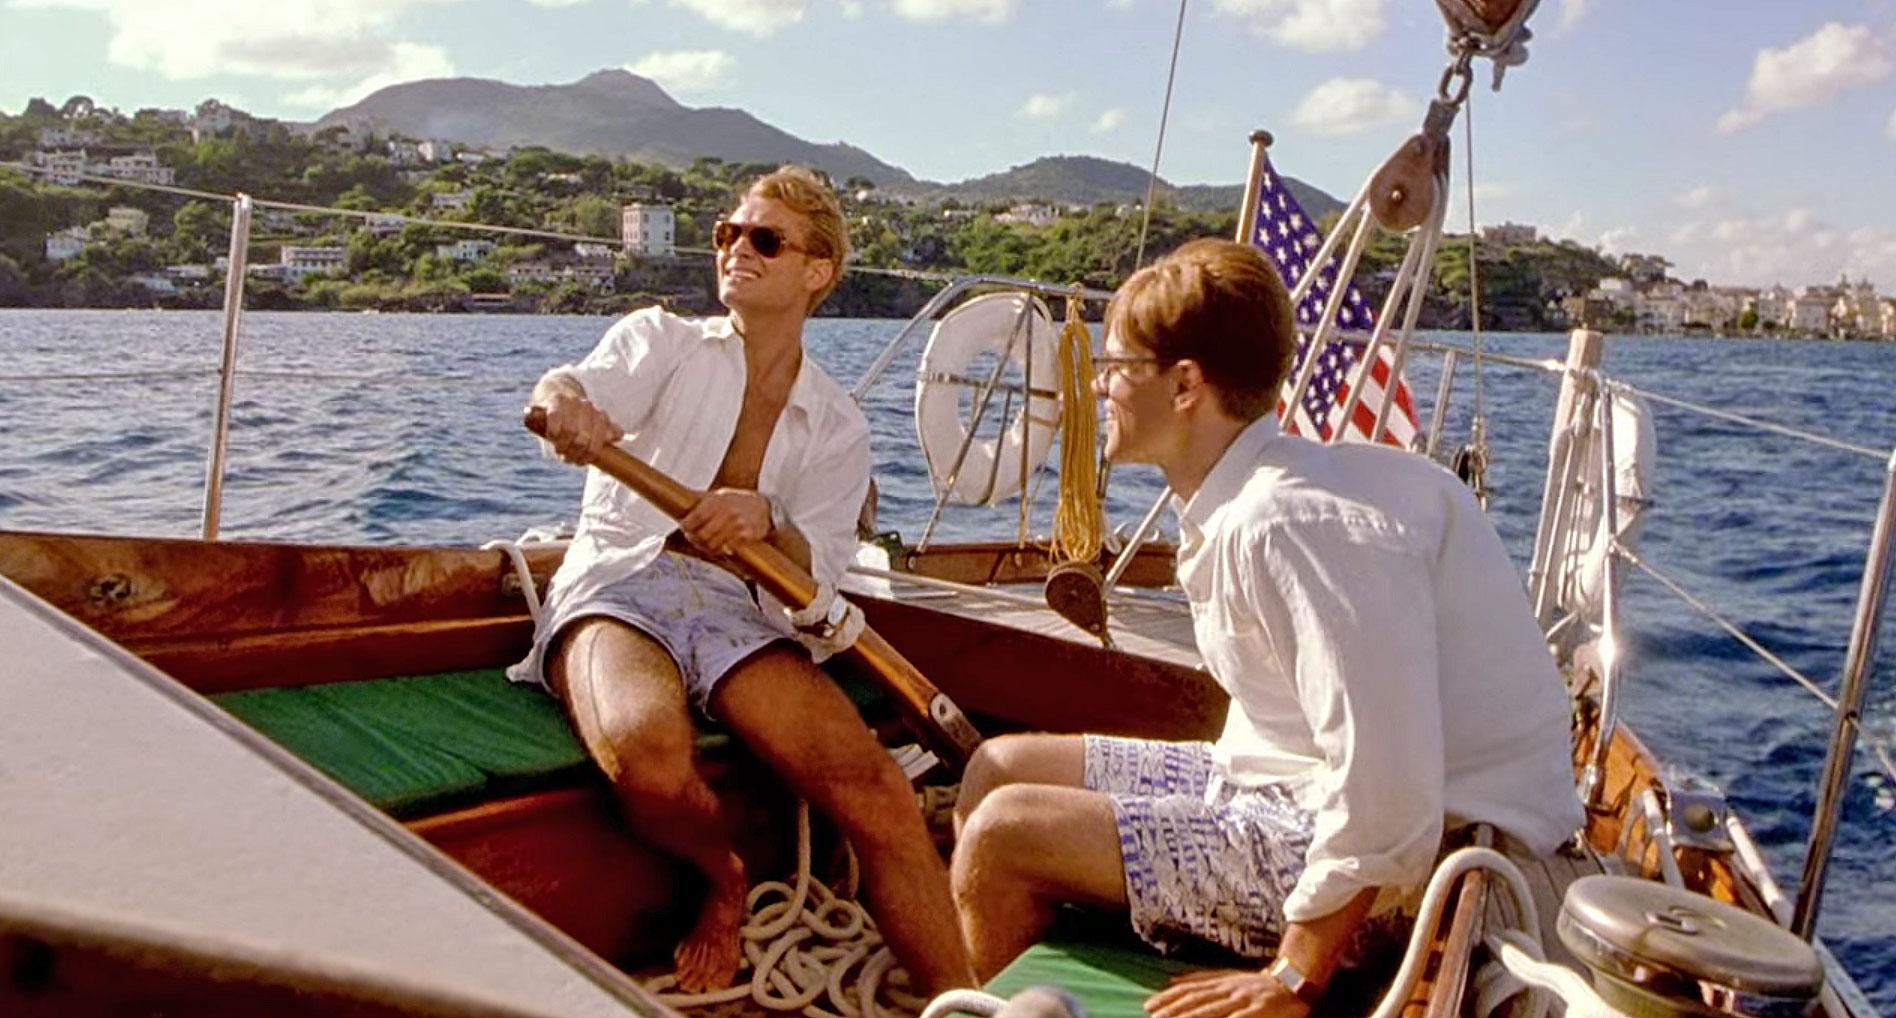 The Talented Mr Ripley boat scene